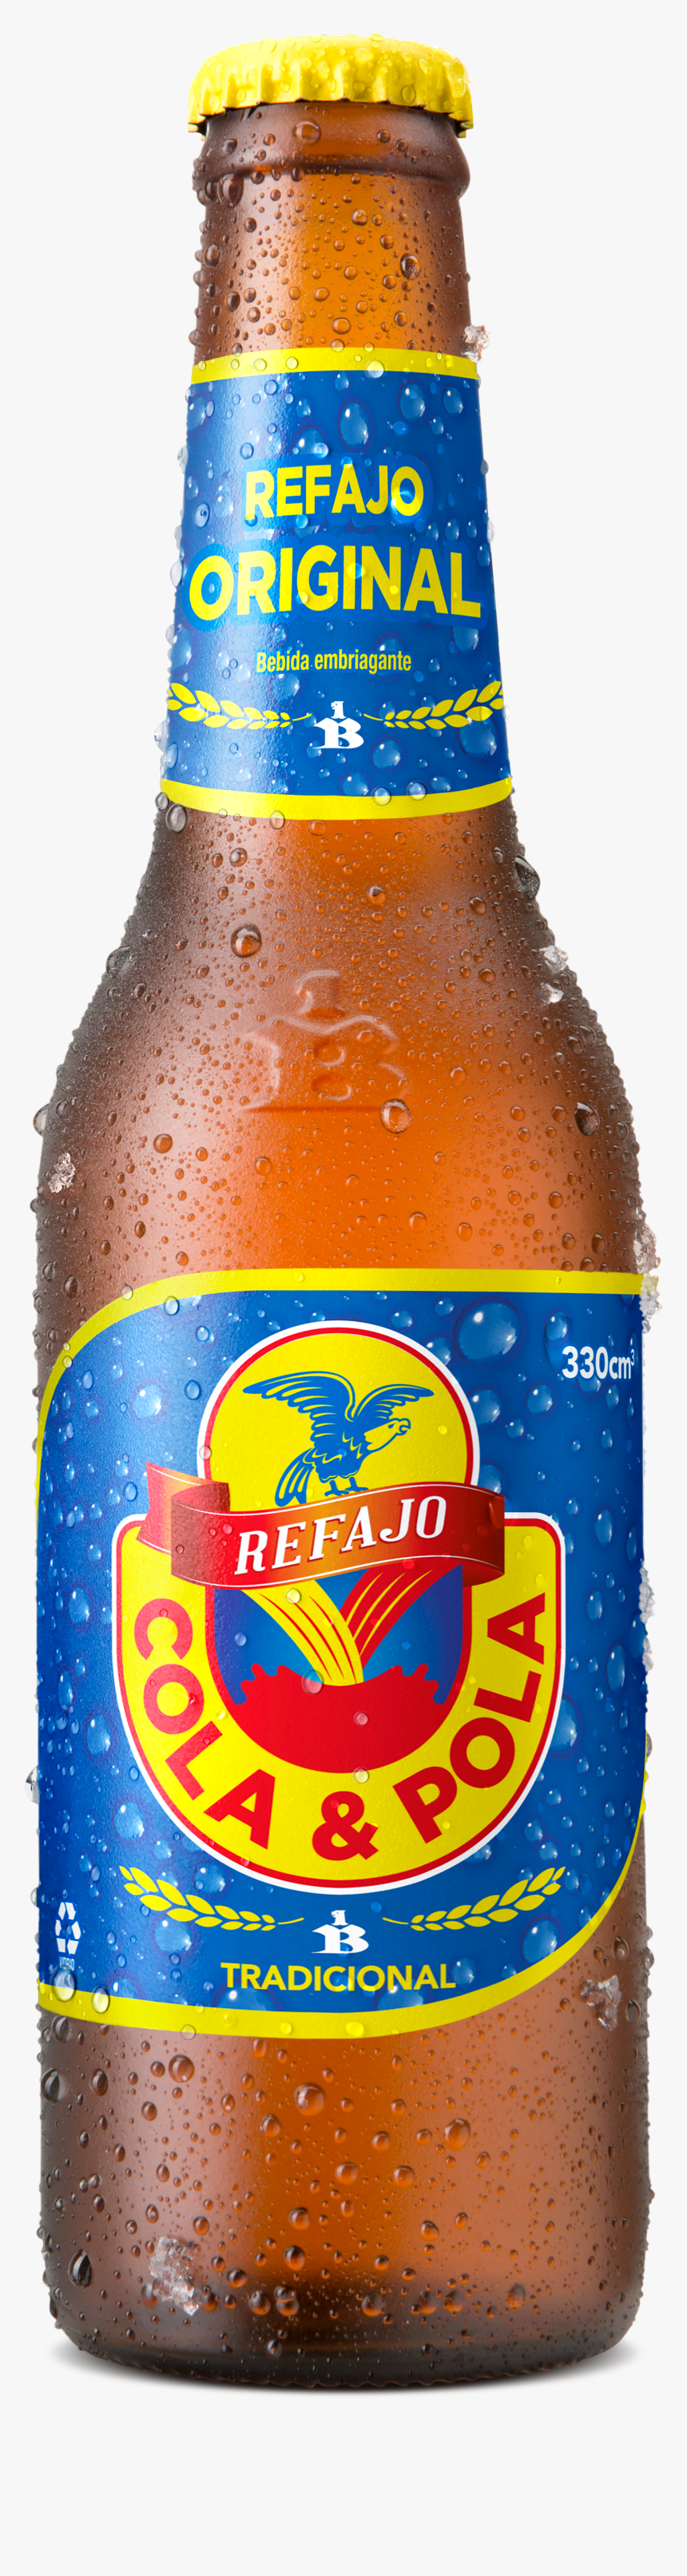 Botella De Cerveza Cola Y Pola Hd Png Download Transparent